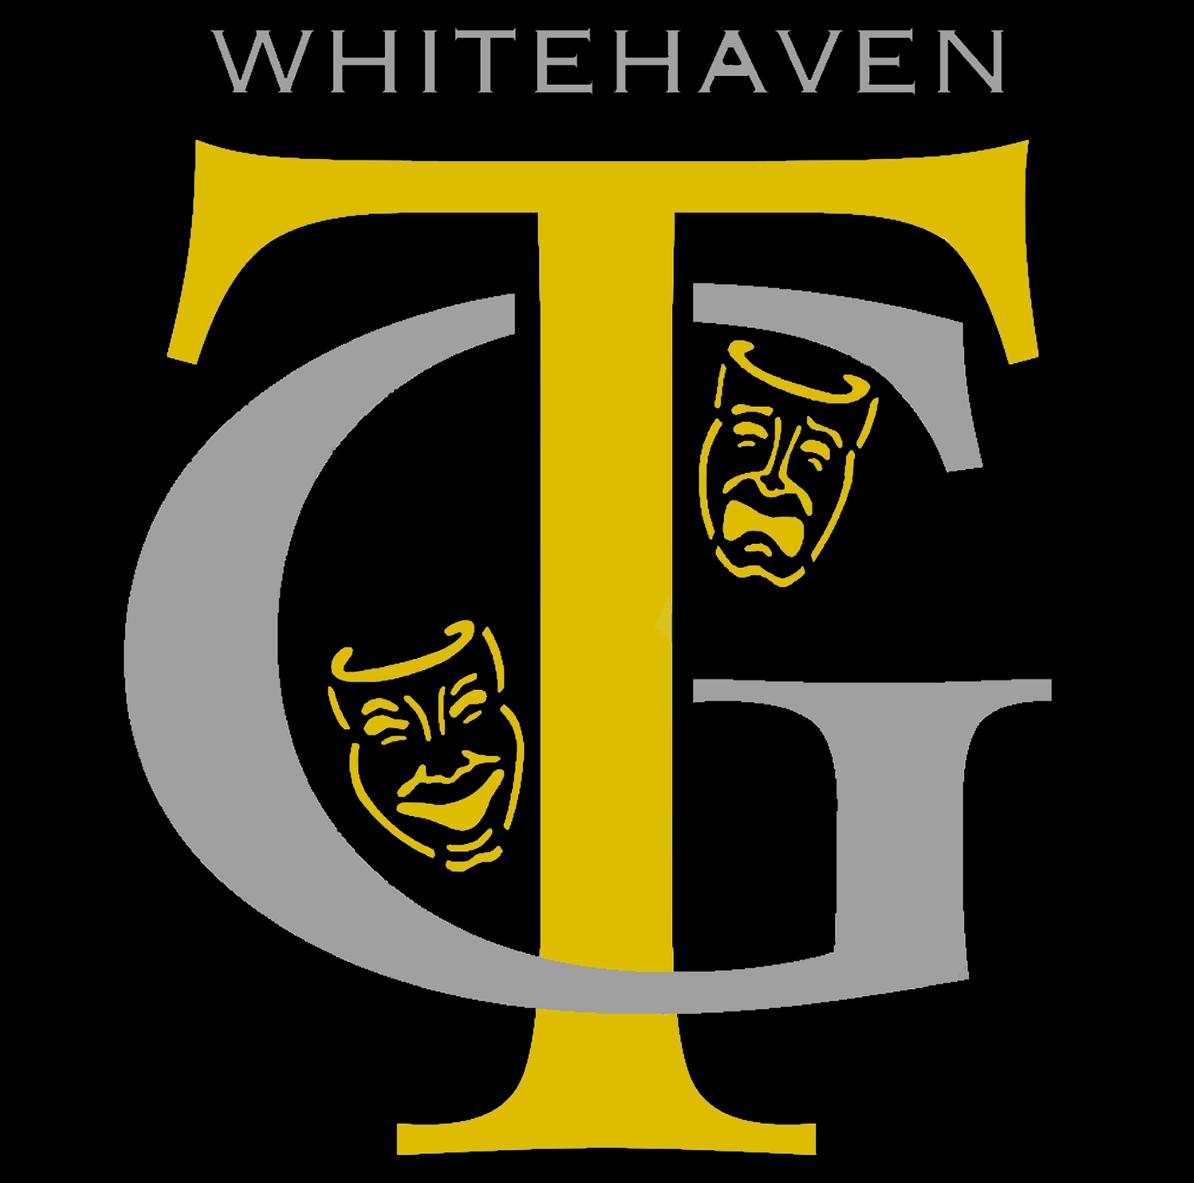 Whitehaven Theatre Group